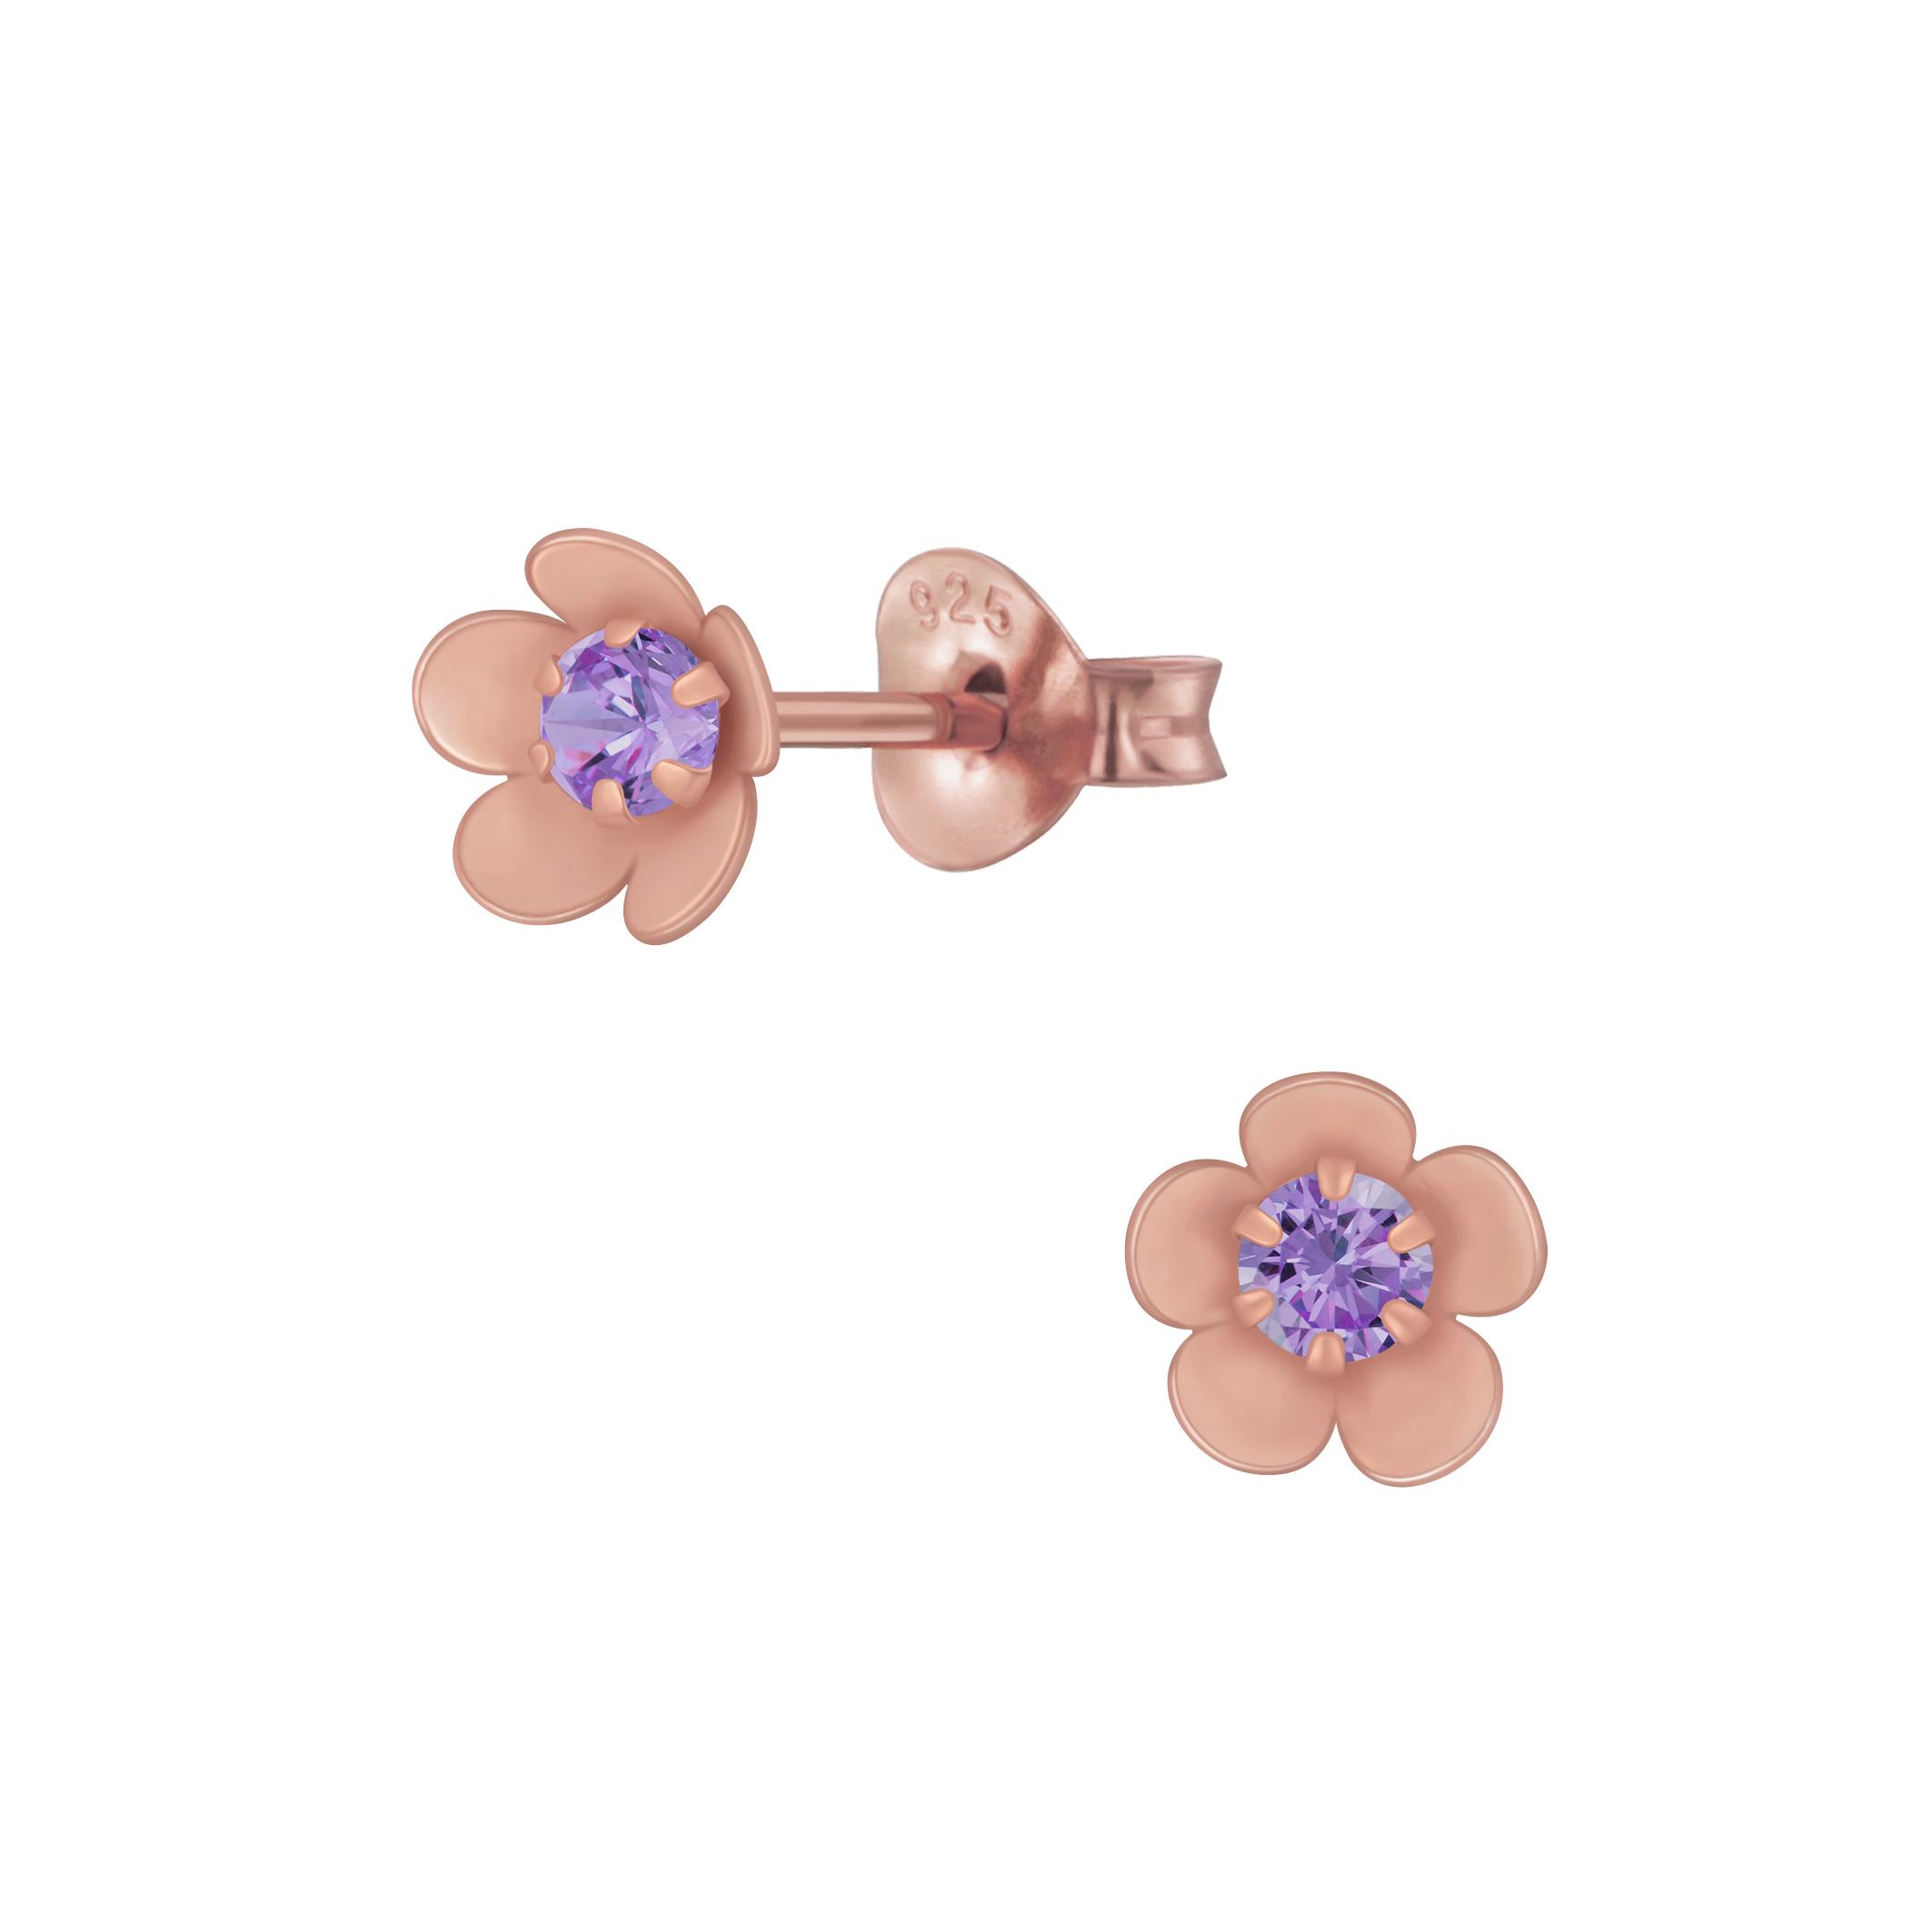 10Pcs//lot Fashion Transparent Color Nose Body Stud Rings Women Jewelry